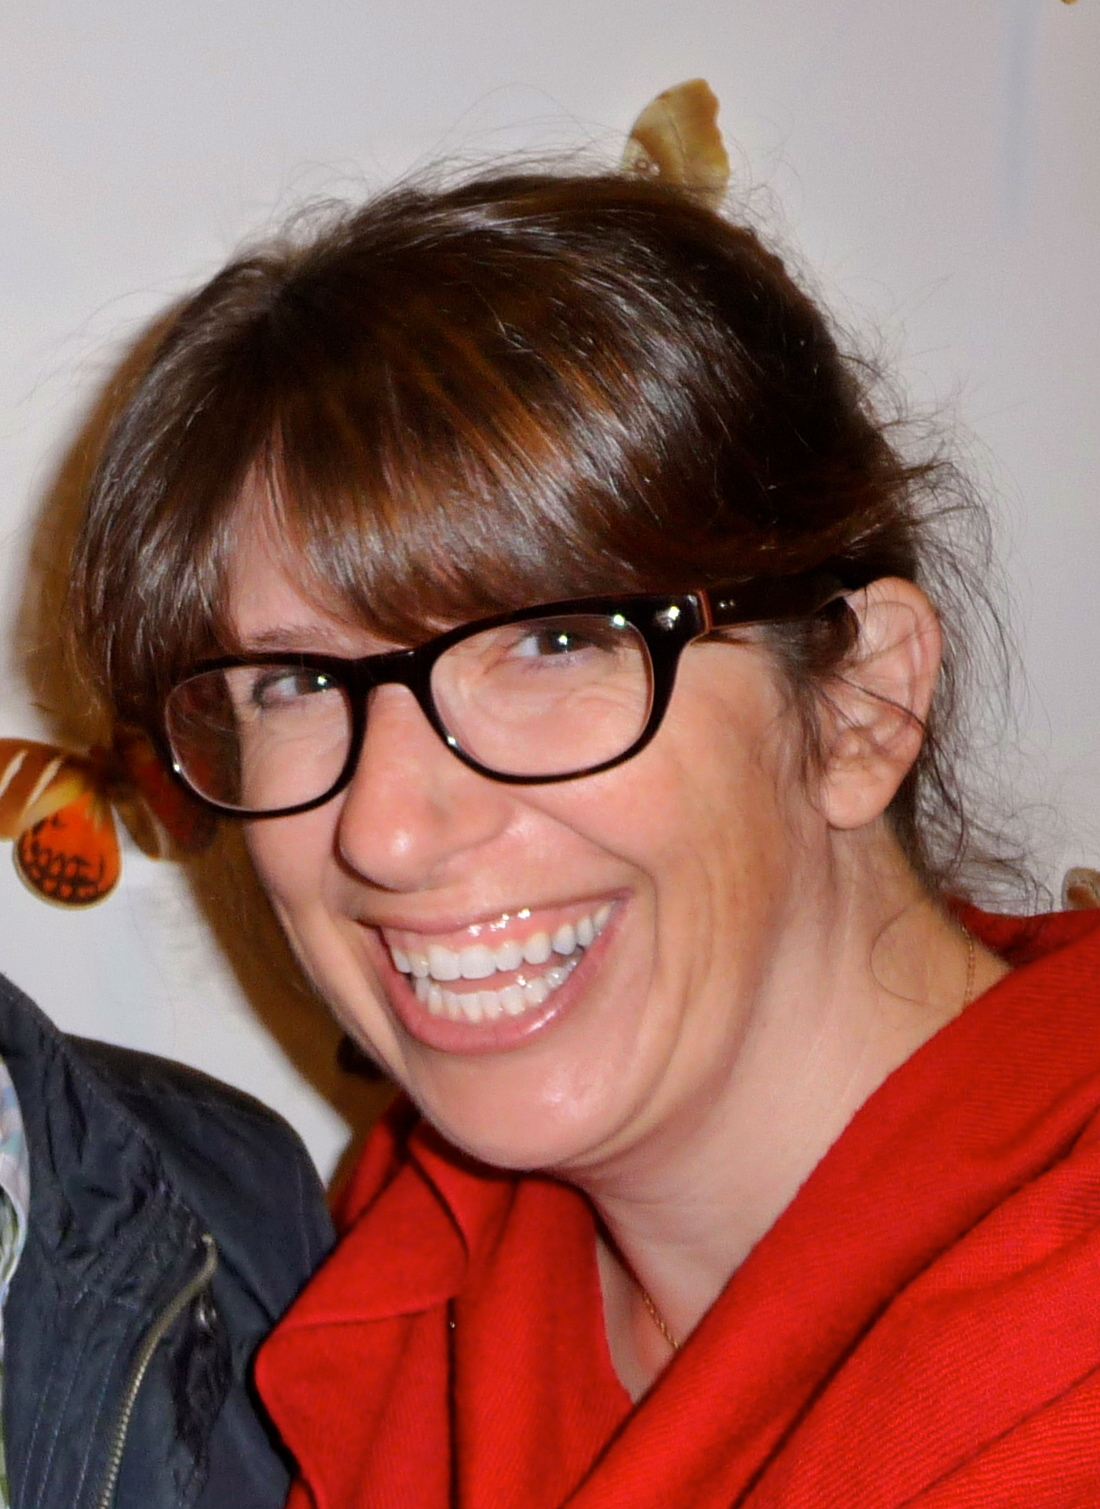 Lori McLeese